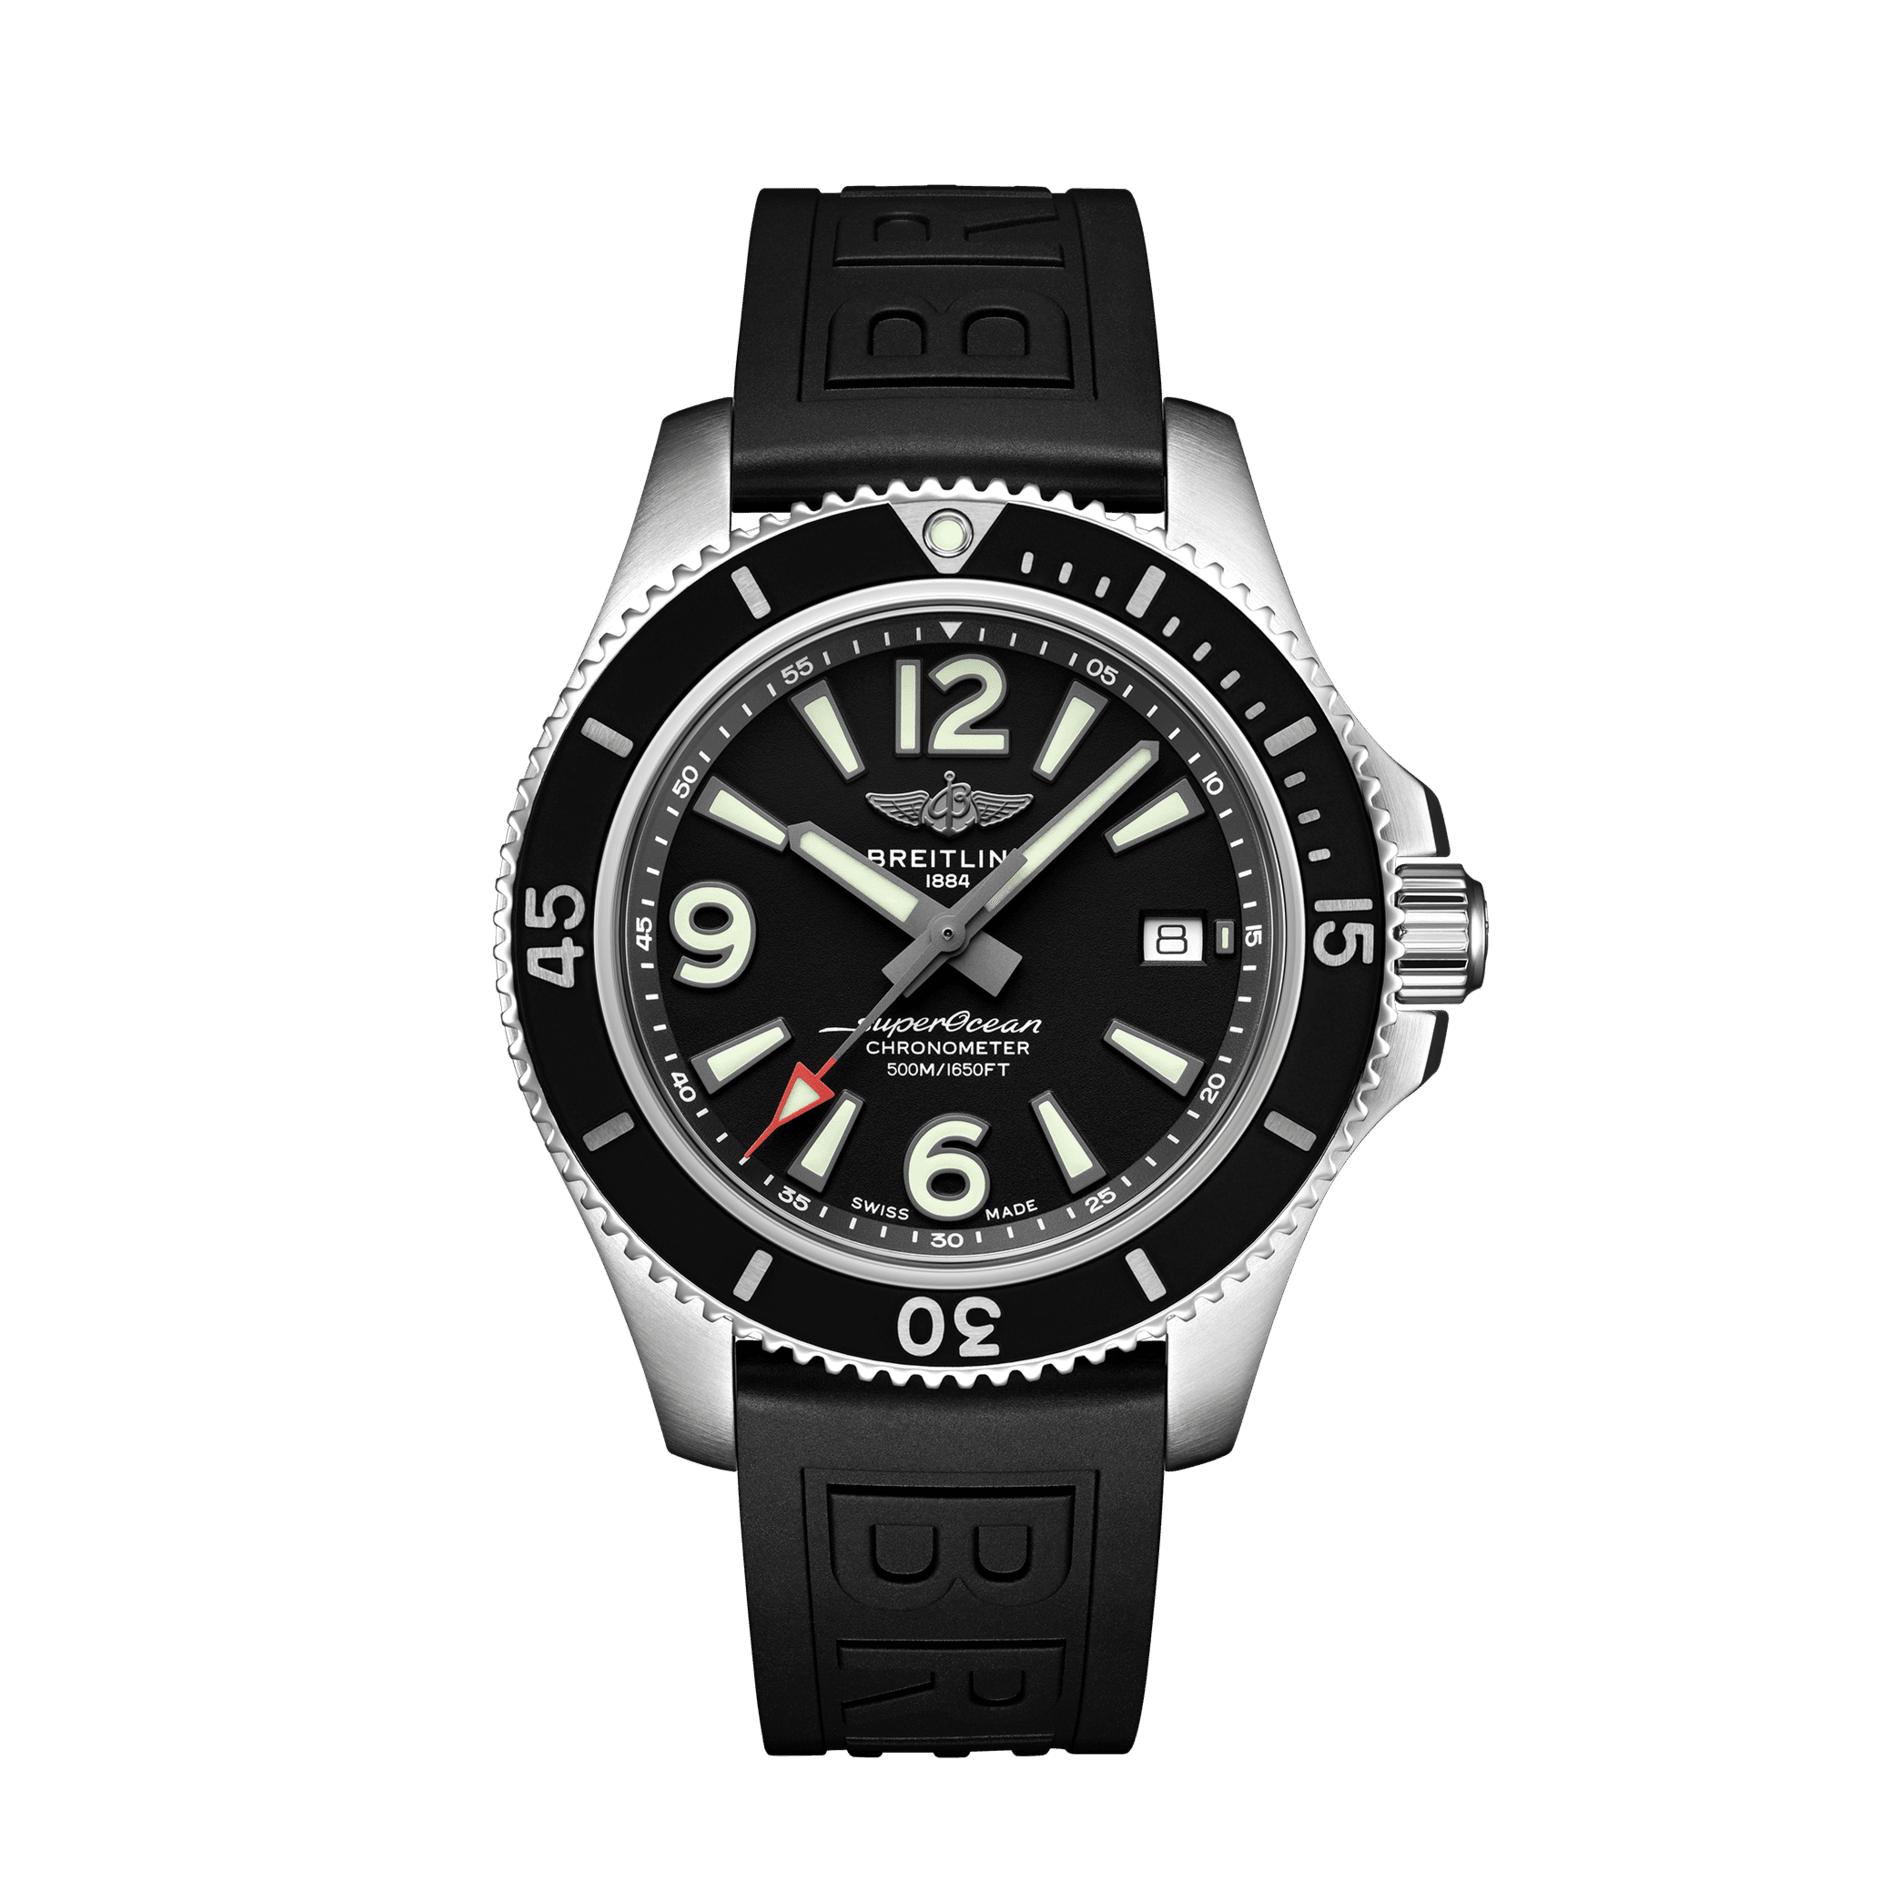 Reloj Breitling – Superocean Automatic 42 - Amaya Joyeros